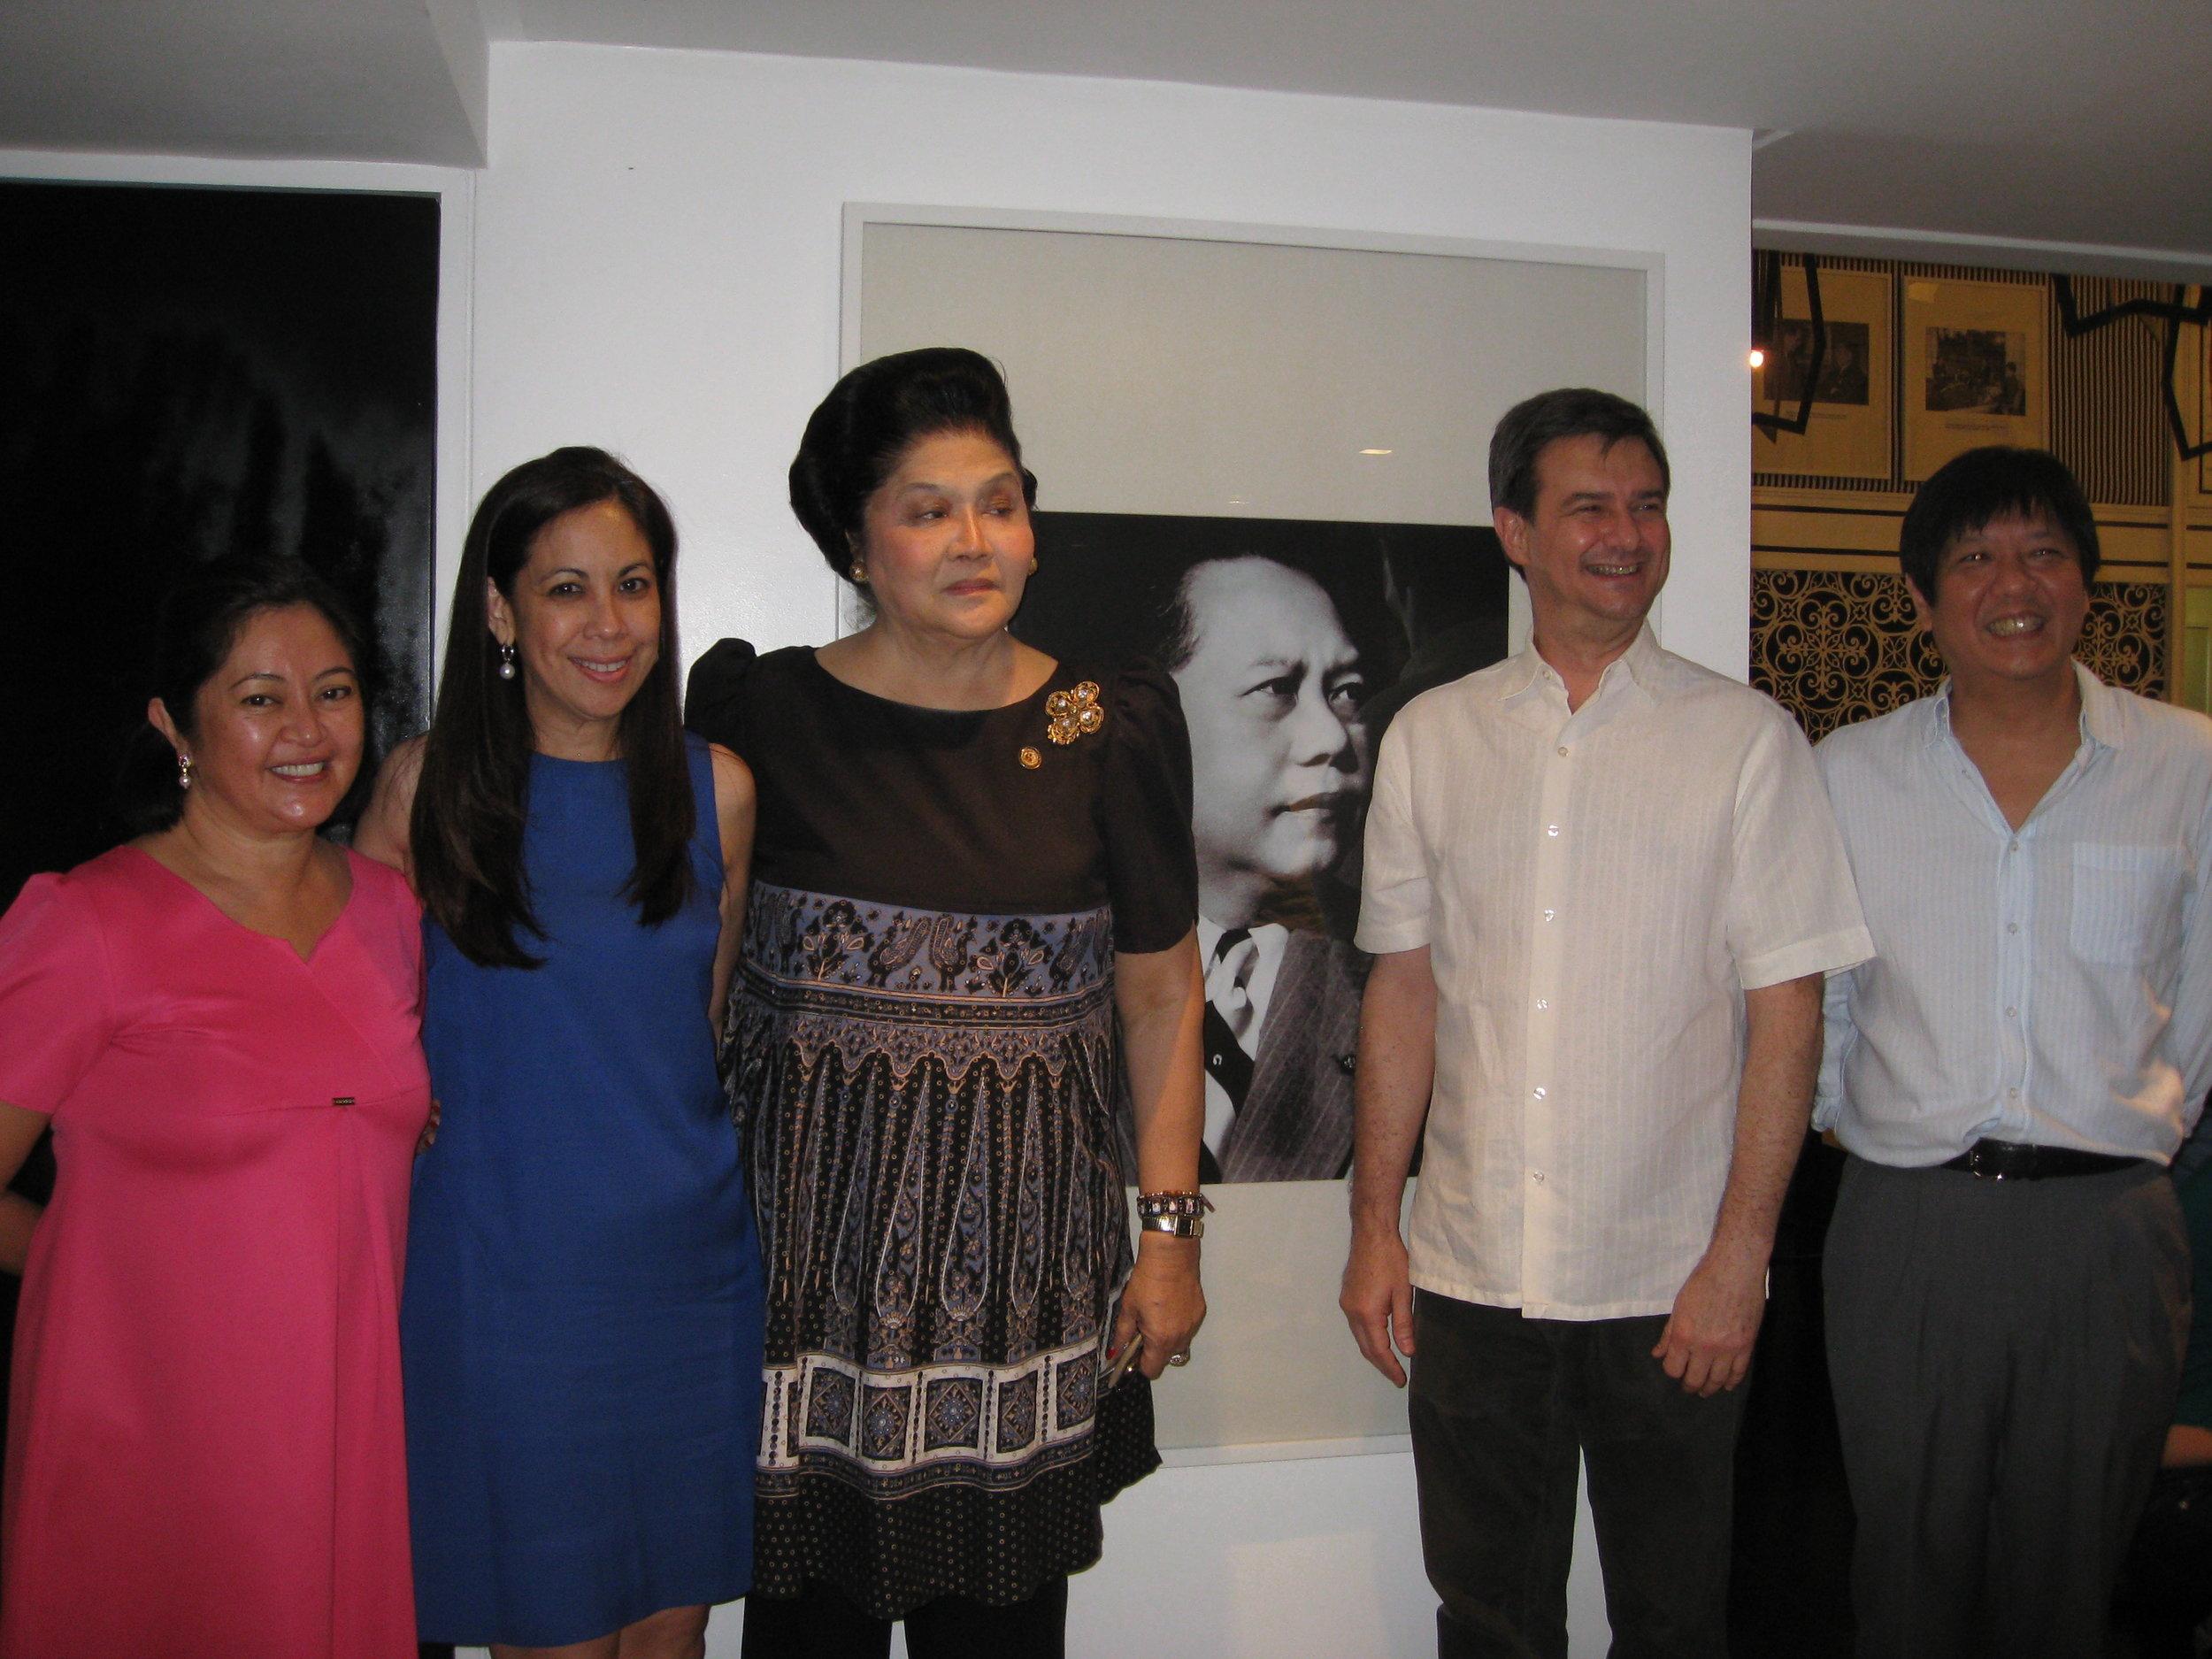 Liza Araneta Marcos, Sandie Squillantini, Imelda Marcos, Enzo Squillantini, and Ferdinand Marcos, Jr.